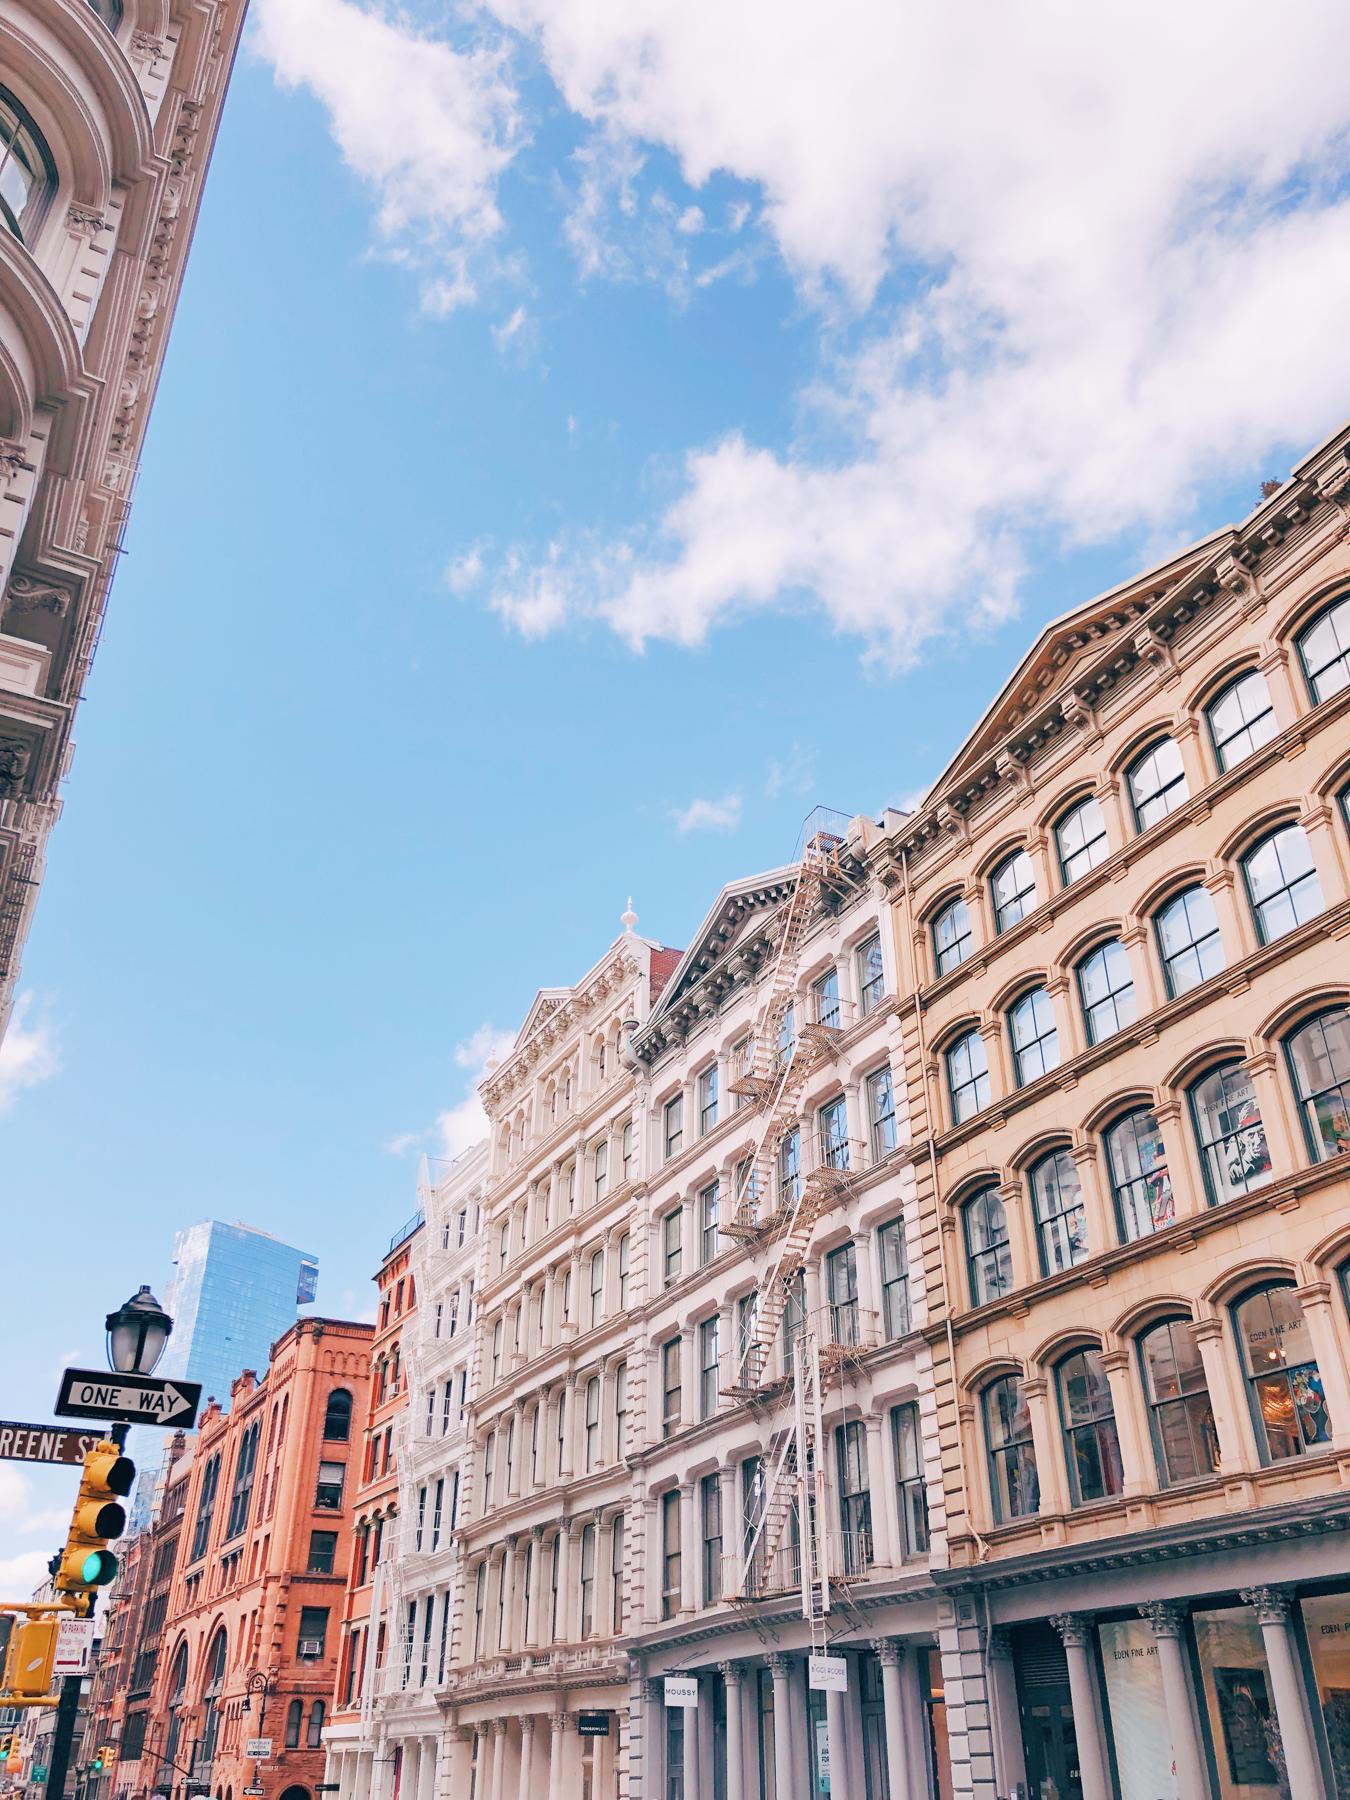 Admiring the beautiful buildings in Soho